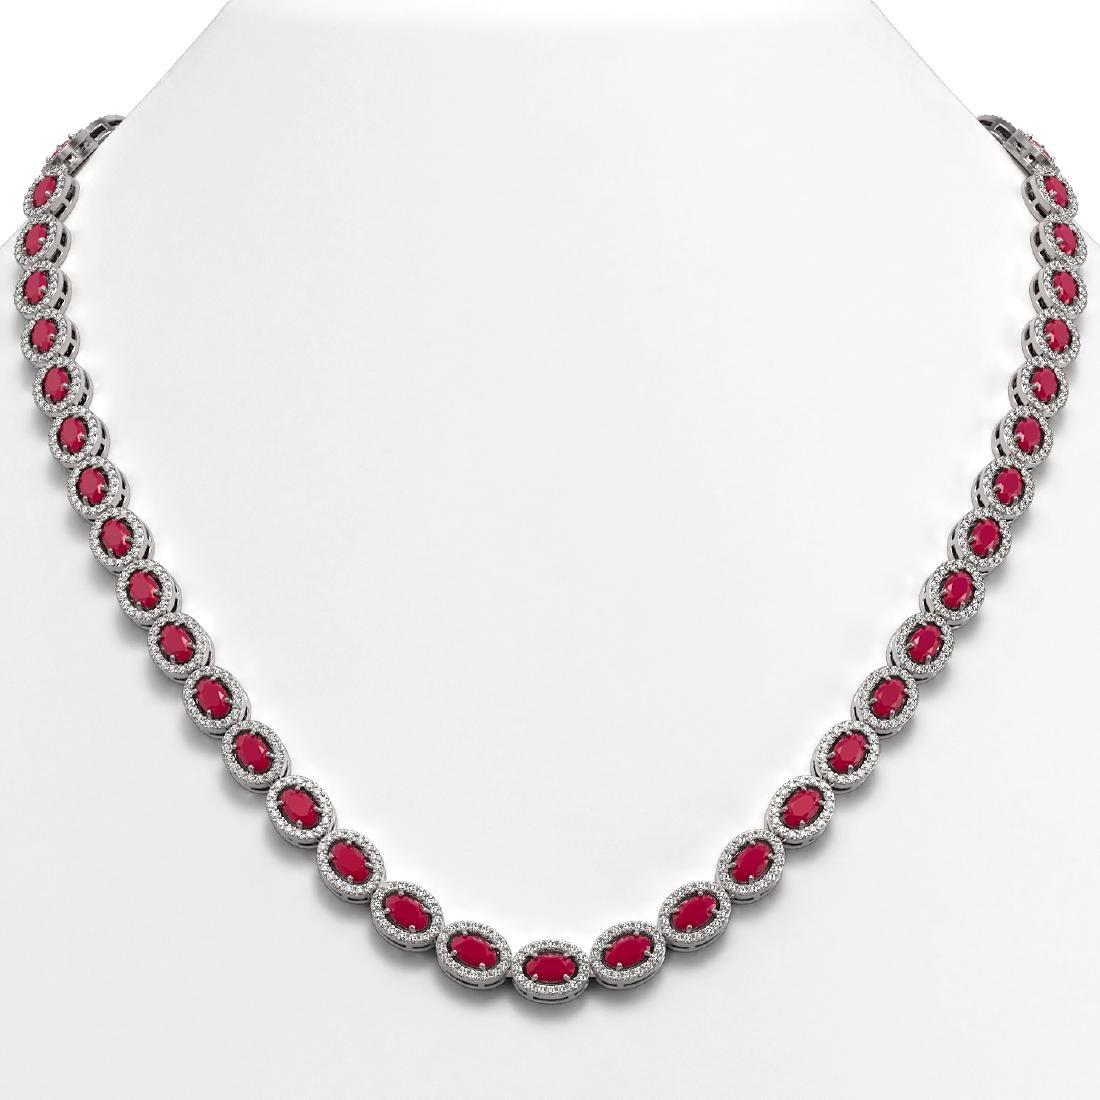 26.38 CTW Ruby & Diamond Halo Necklace 10K White Gold